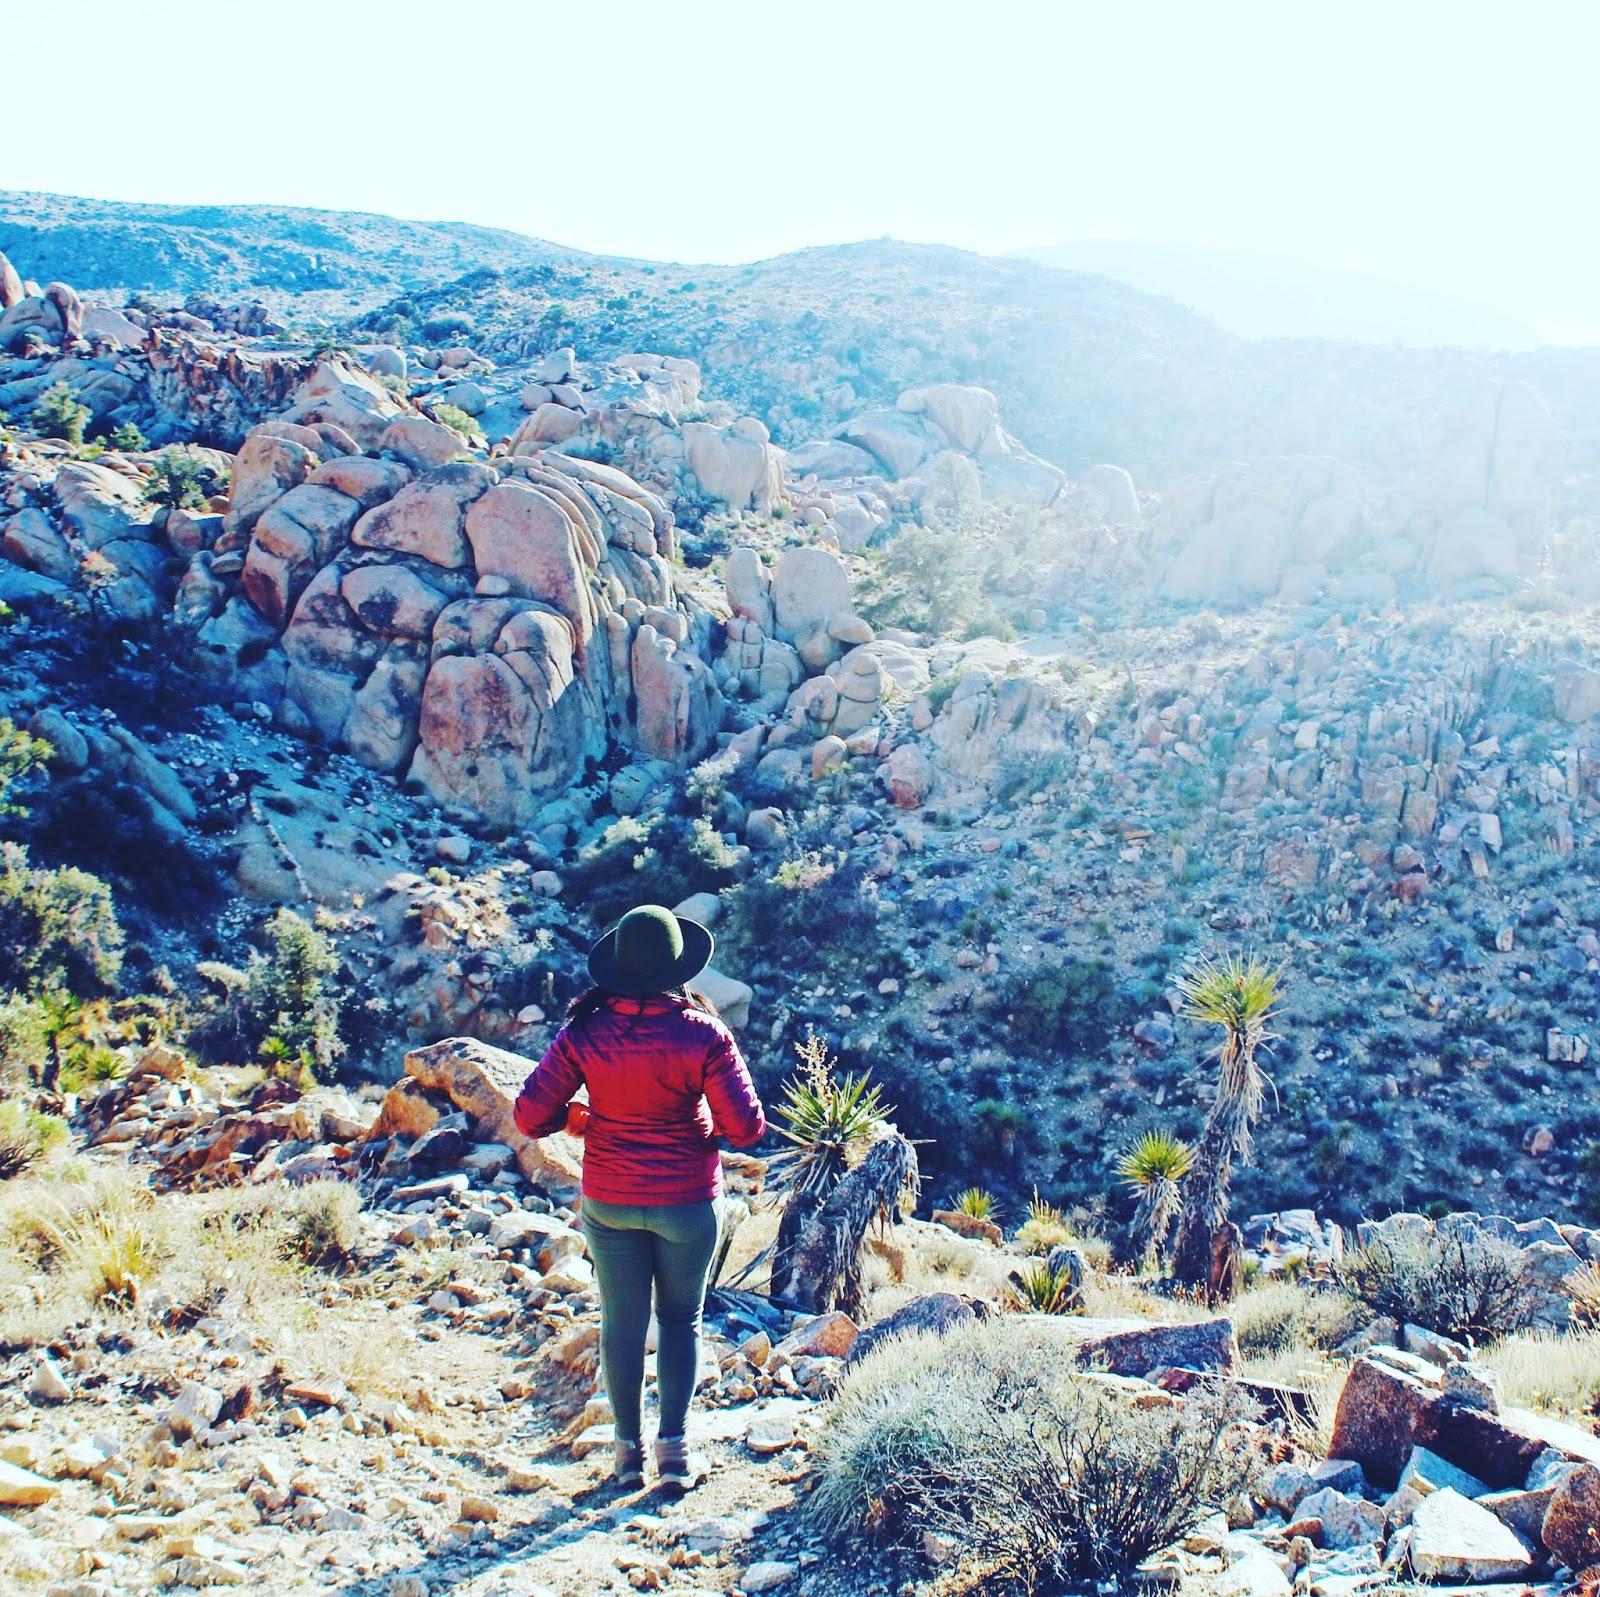 making restorations blog southwest road trip itinerary budget 20